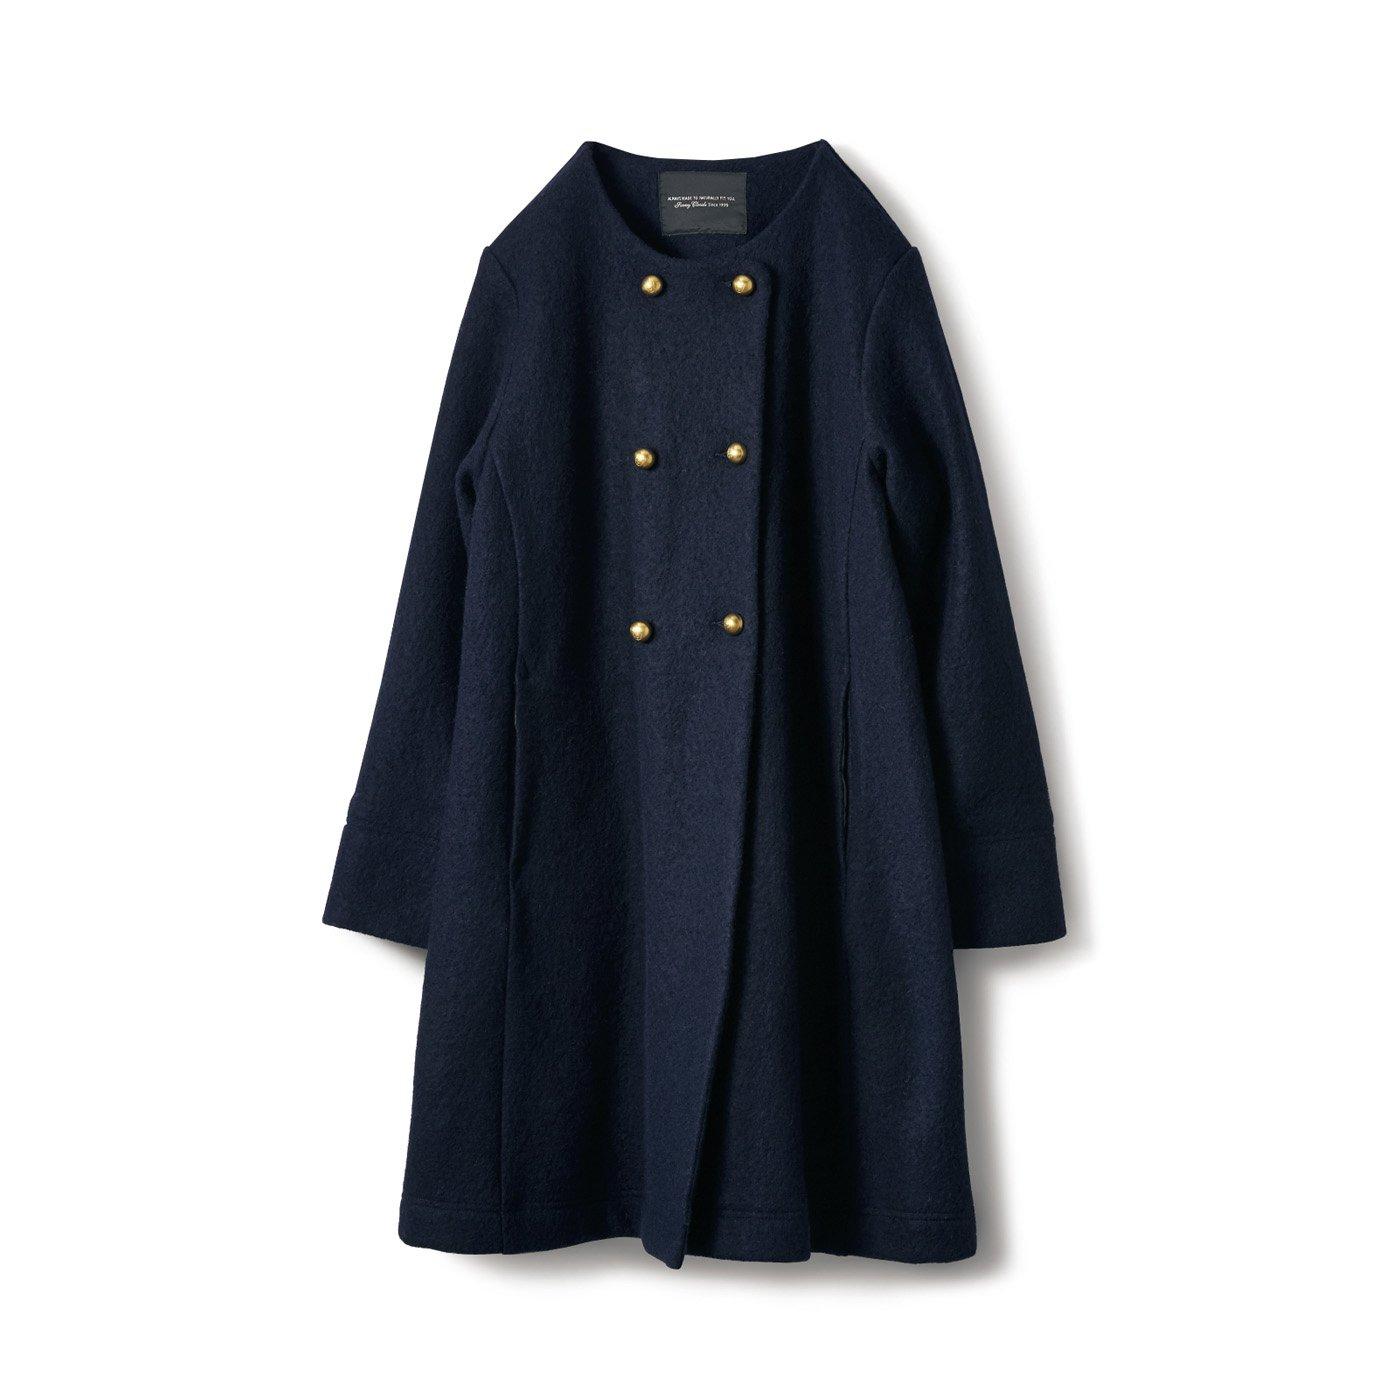 SUNNY CLOUDS  縮絨ニットコート〈レディース〉紺